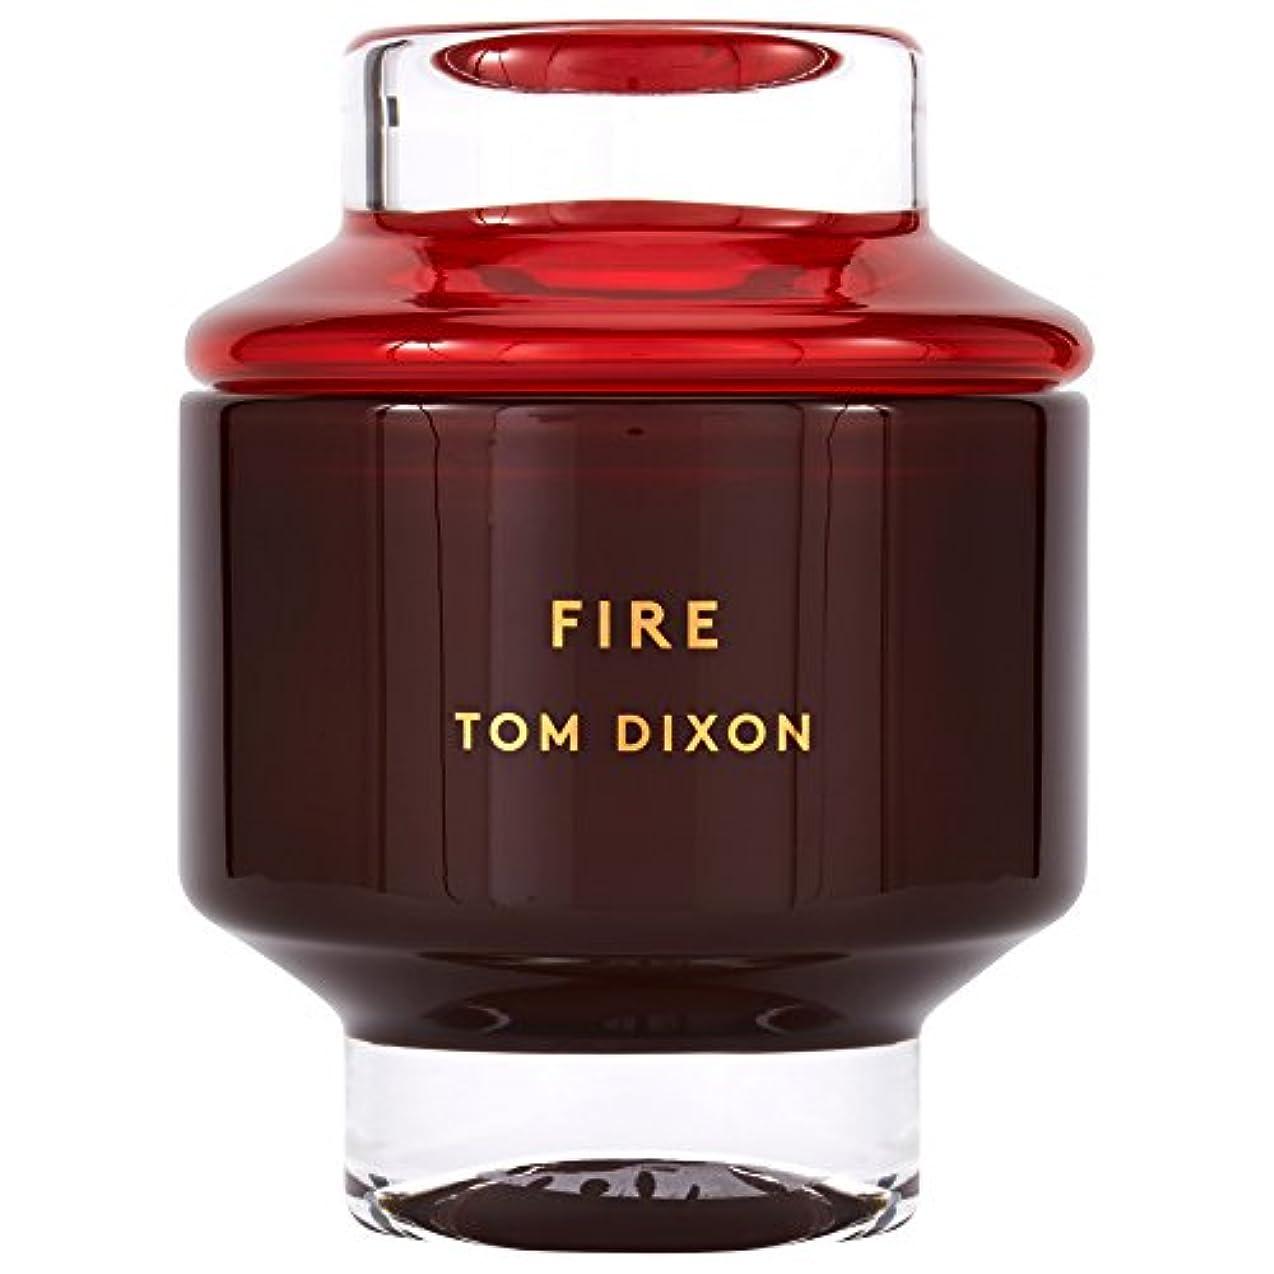 Tom Dixon Fire Scented Candle Large (Pack of 2) - トム?ディクソン火災大型香りのキャンドル x2 [並行輸入品]